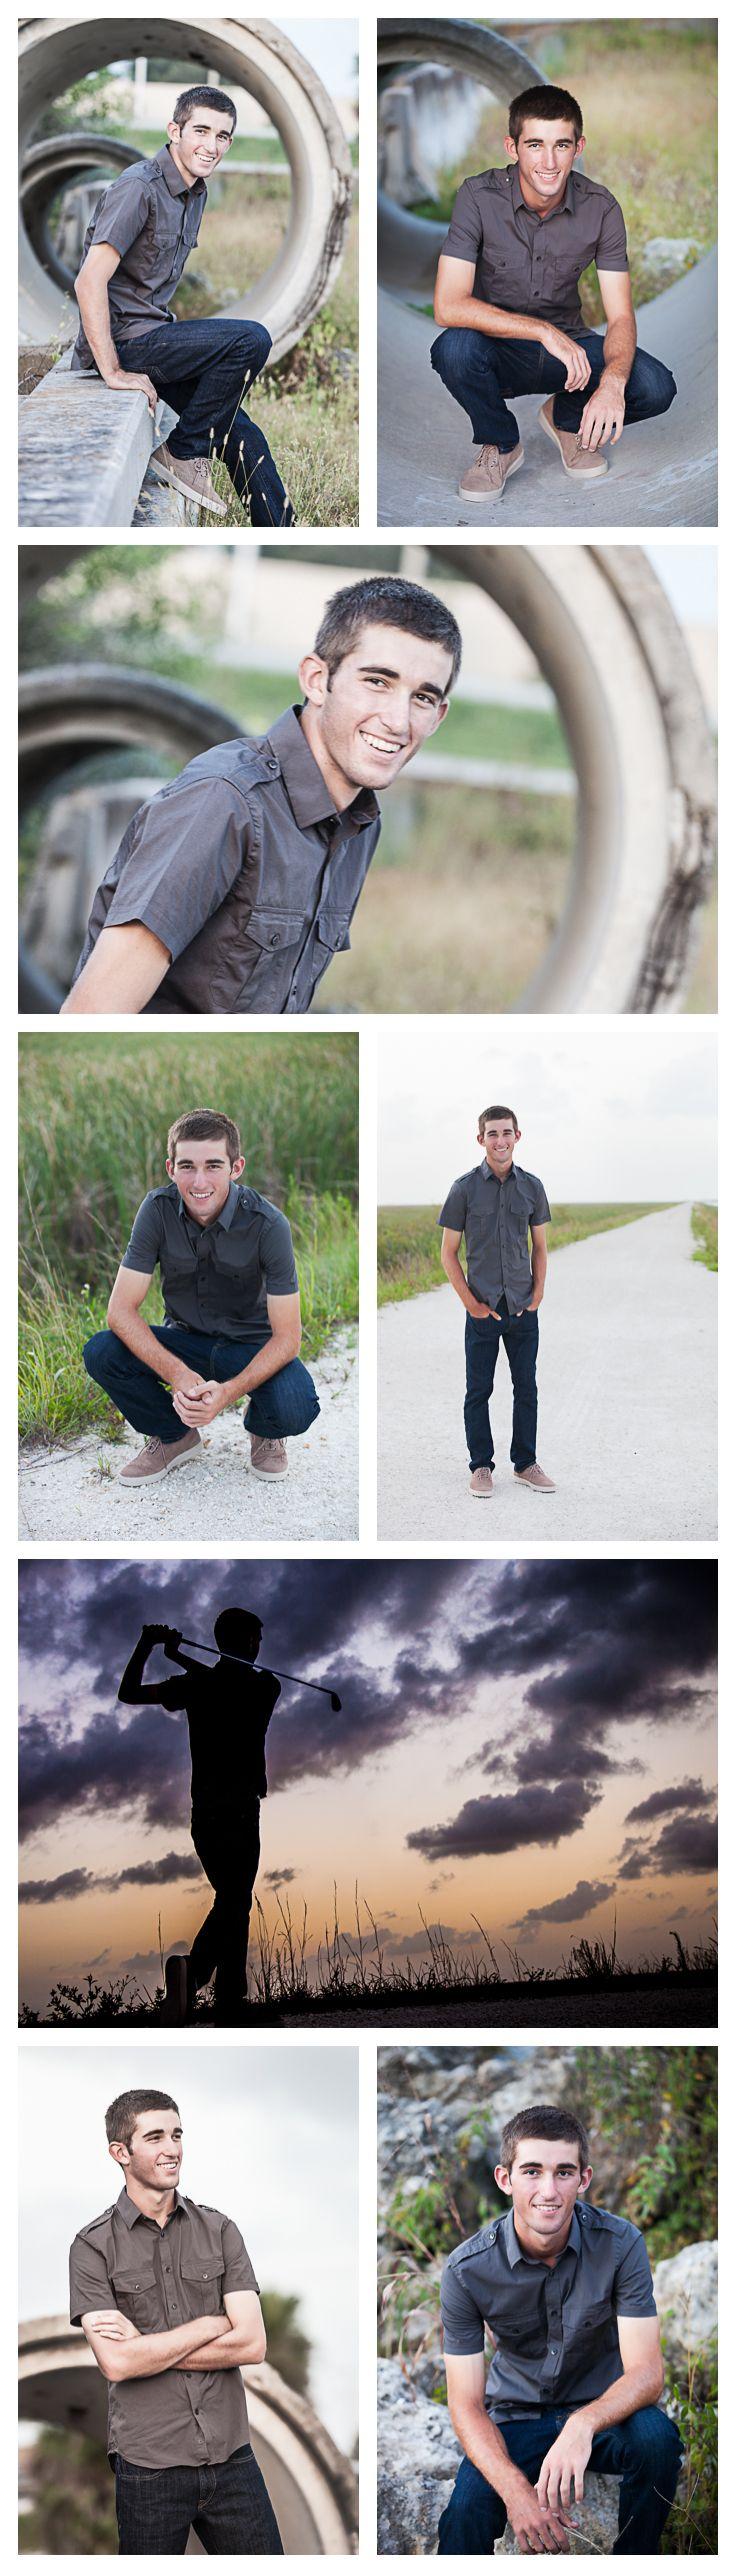 South Florida High School Senior Photography